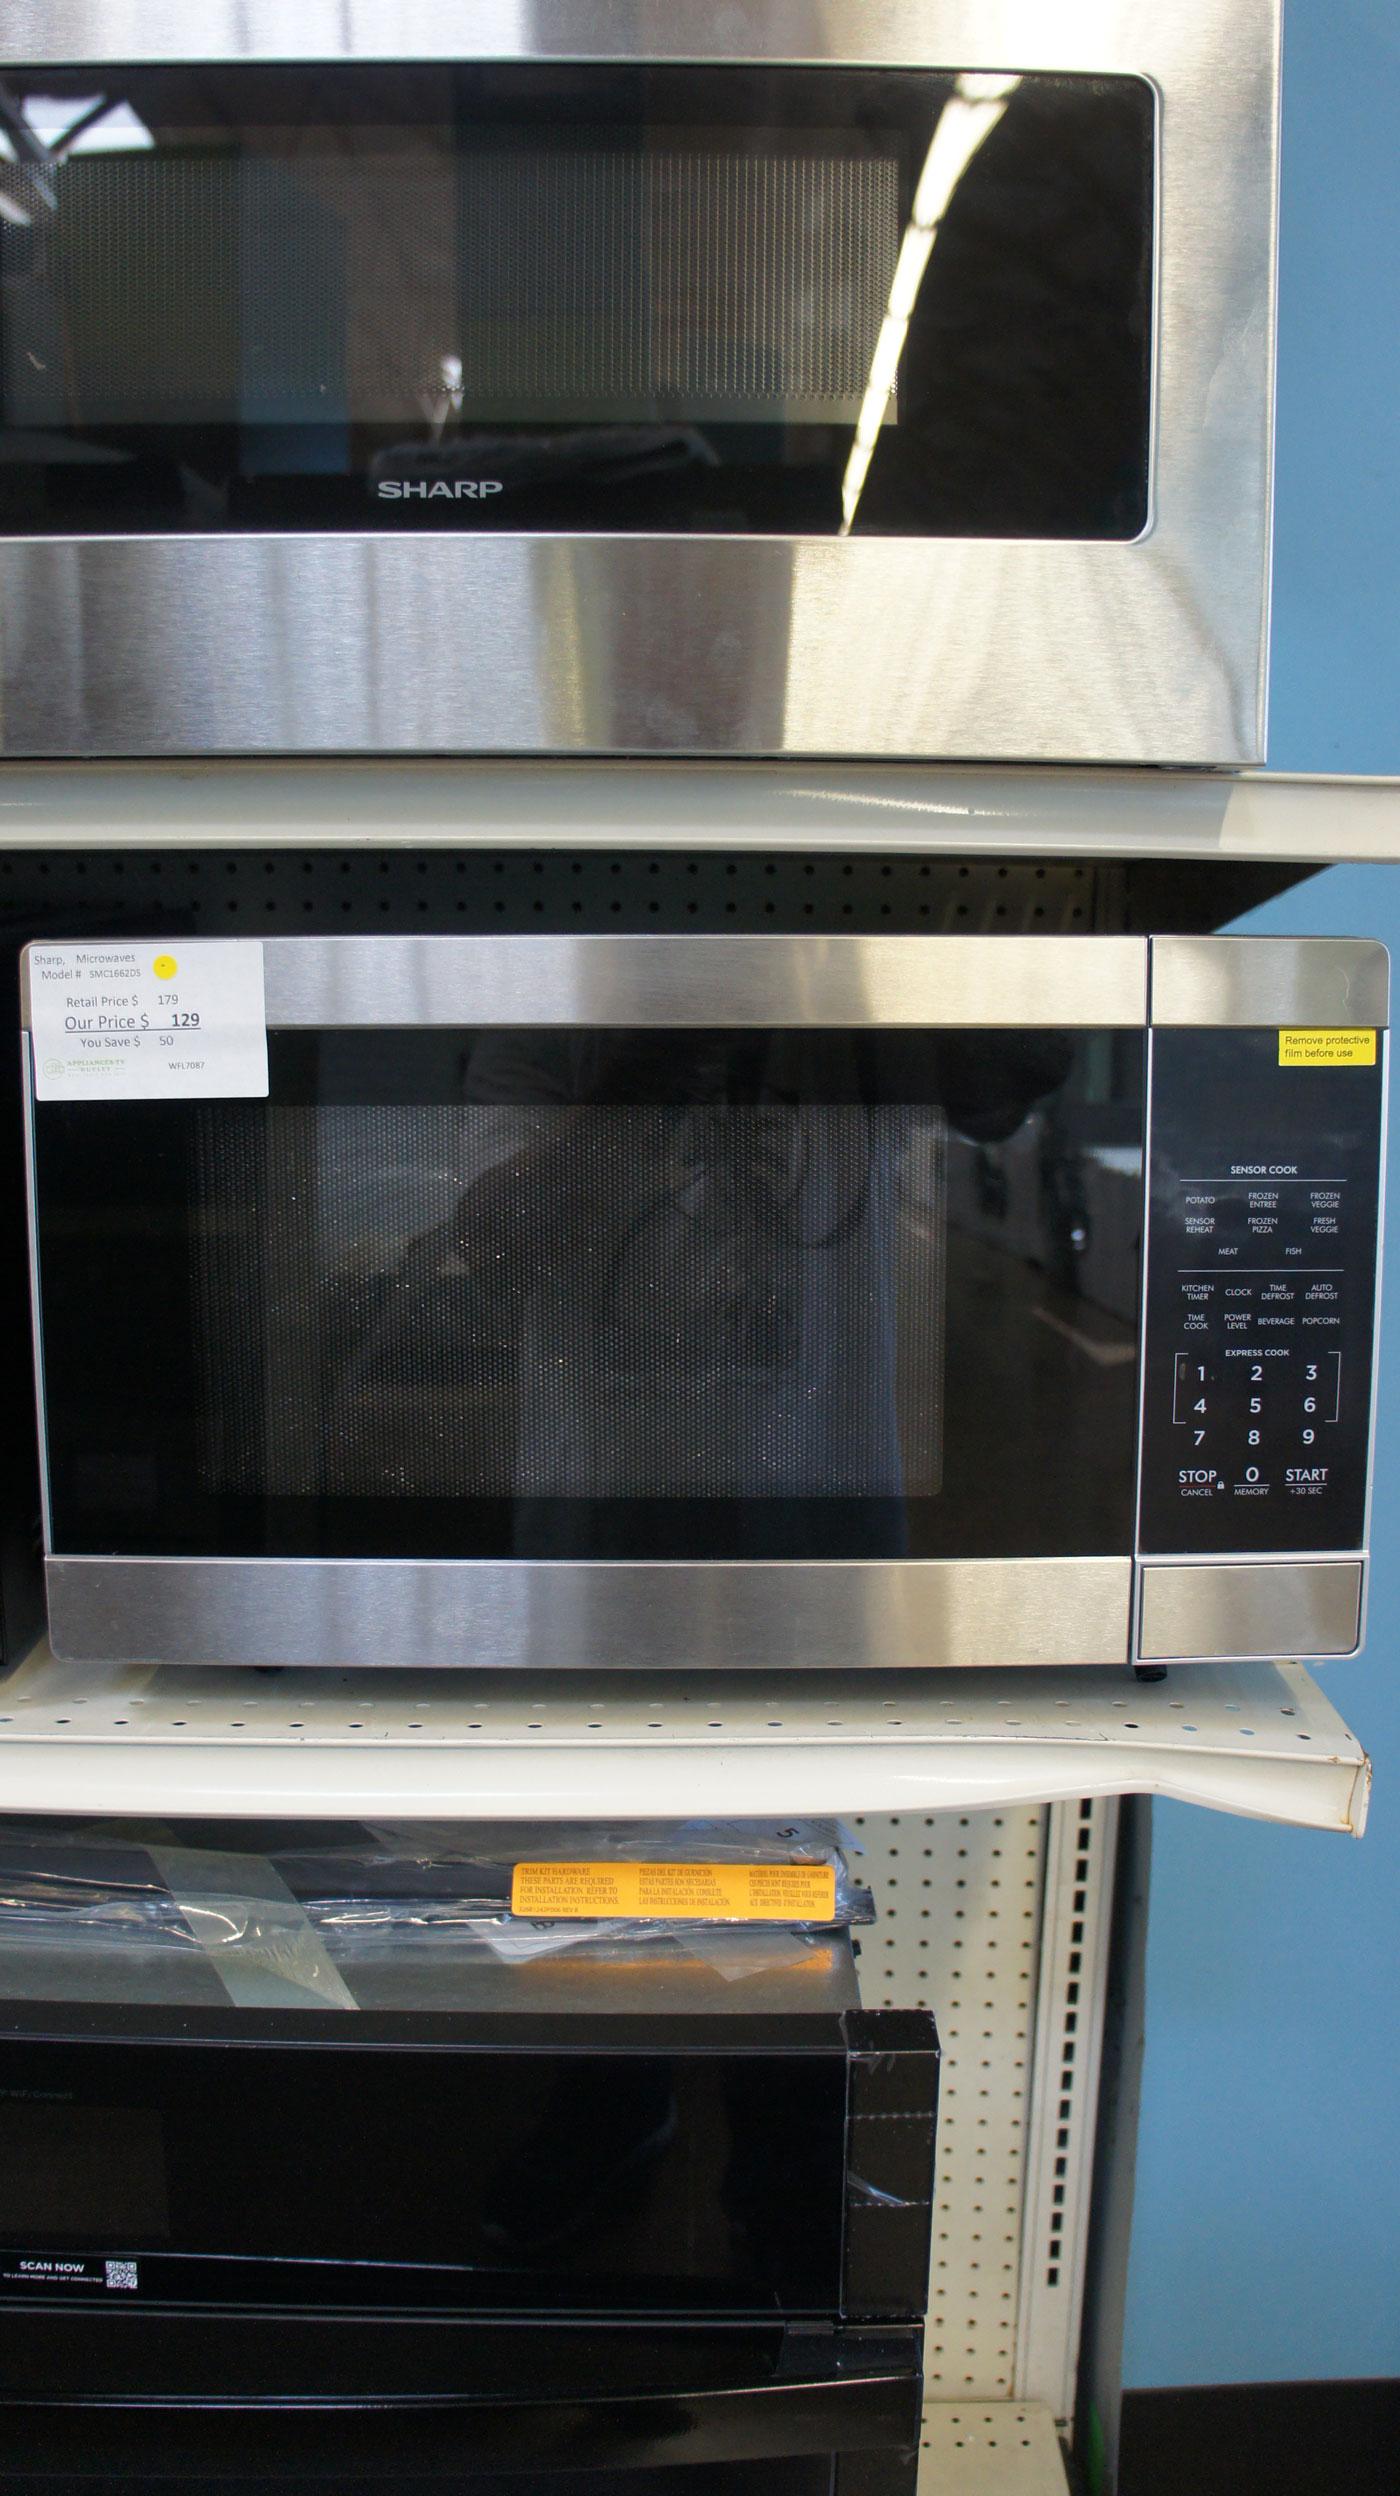 Sharp SMC1662DS Microwave